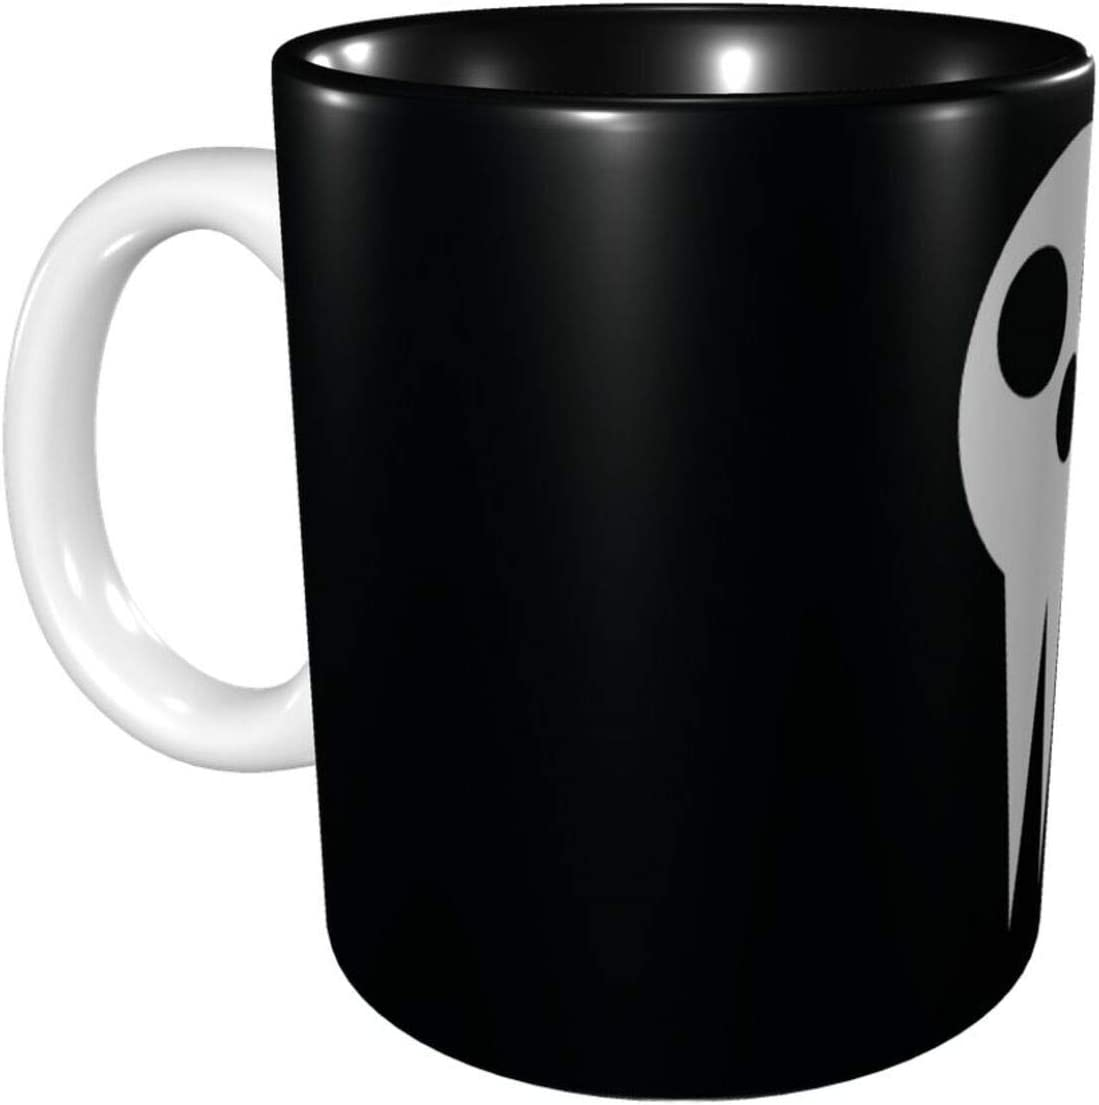 BenjaminNash Soul Eater Anime Coffee Mug Big Tea Cup Personality Ceramic Coffee Mug Hot Travel Mug Hot Chocolate Mugs Restaurant Coffee Mug 11 Oz Black